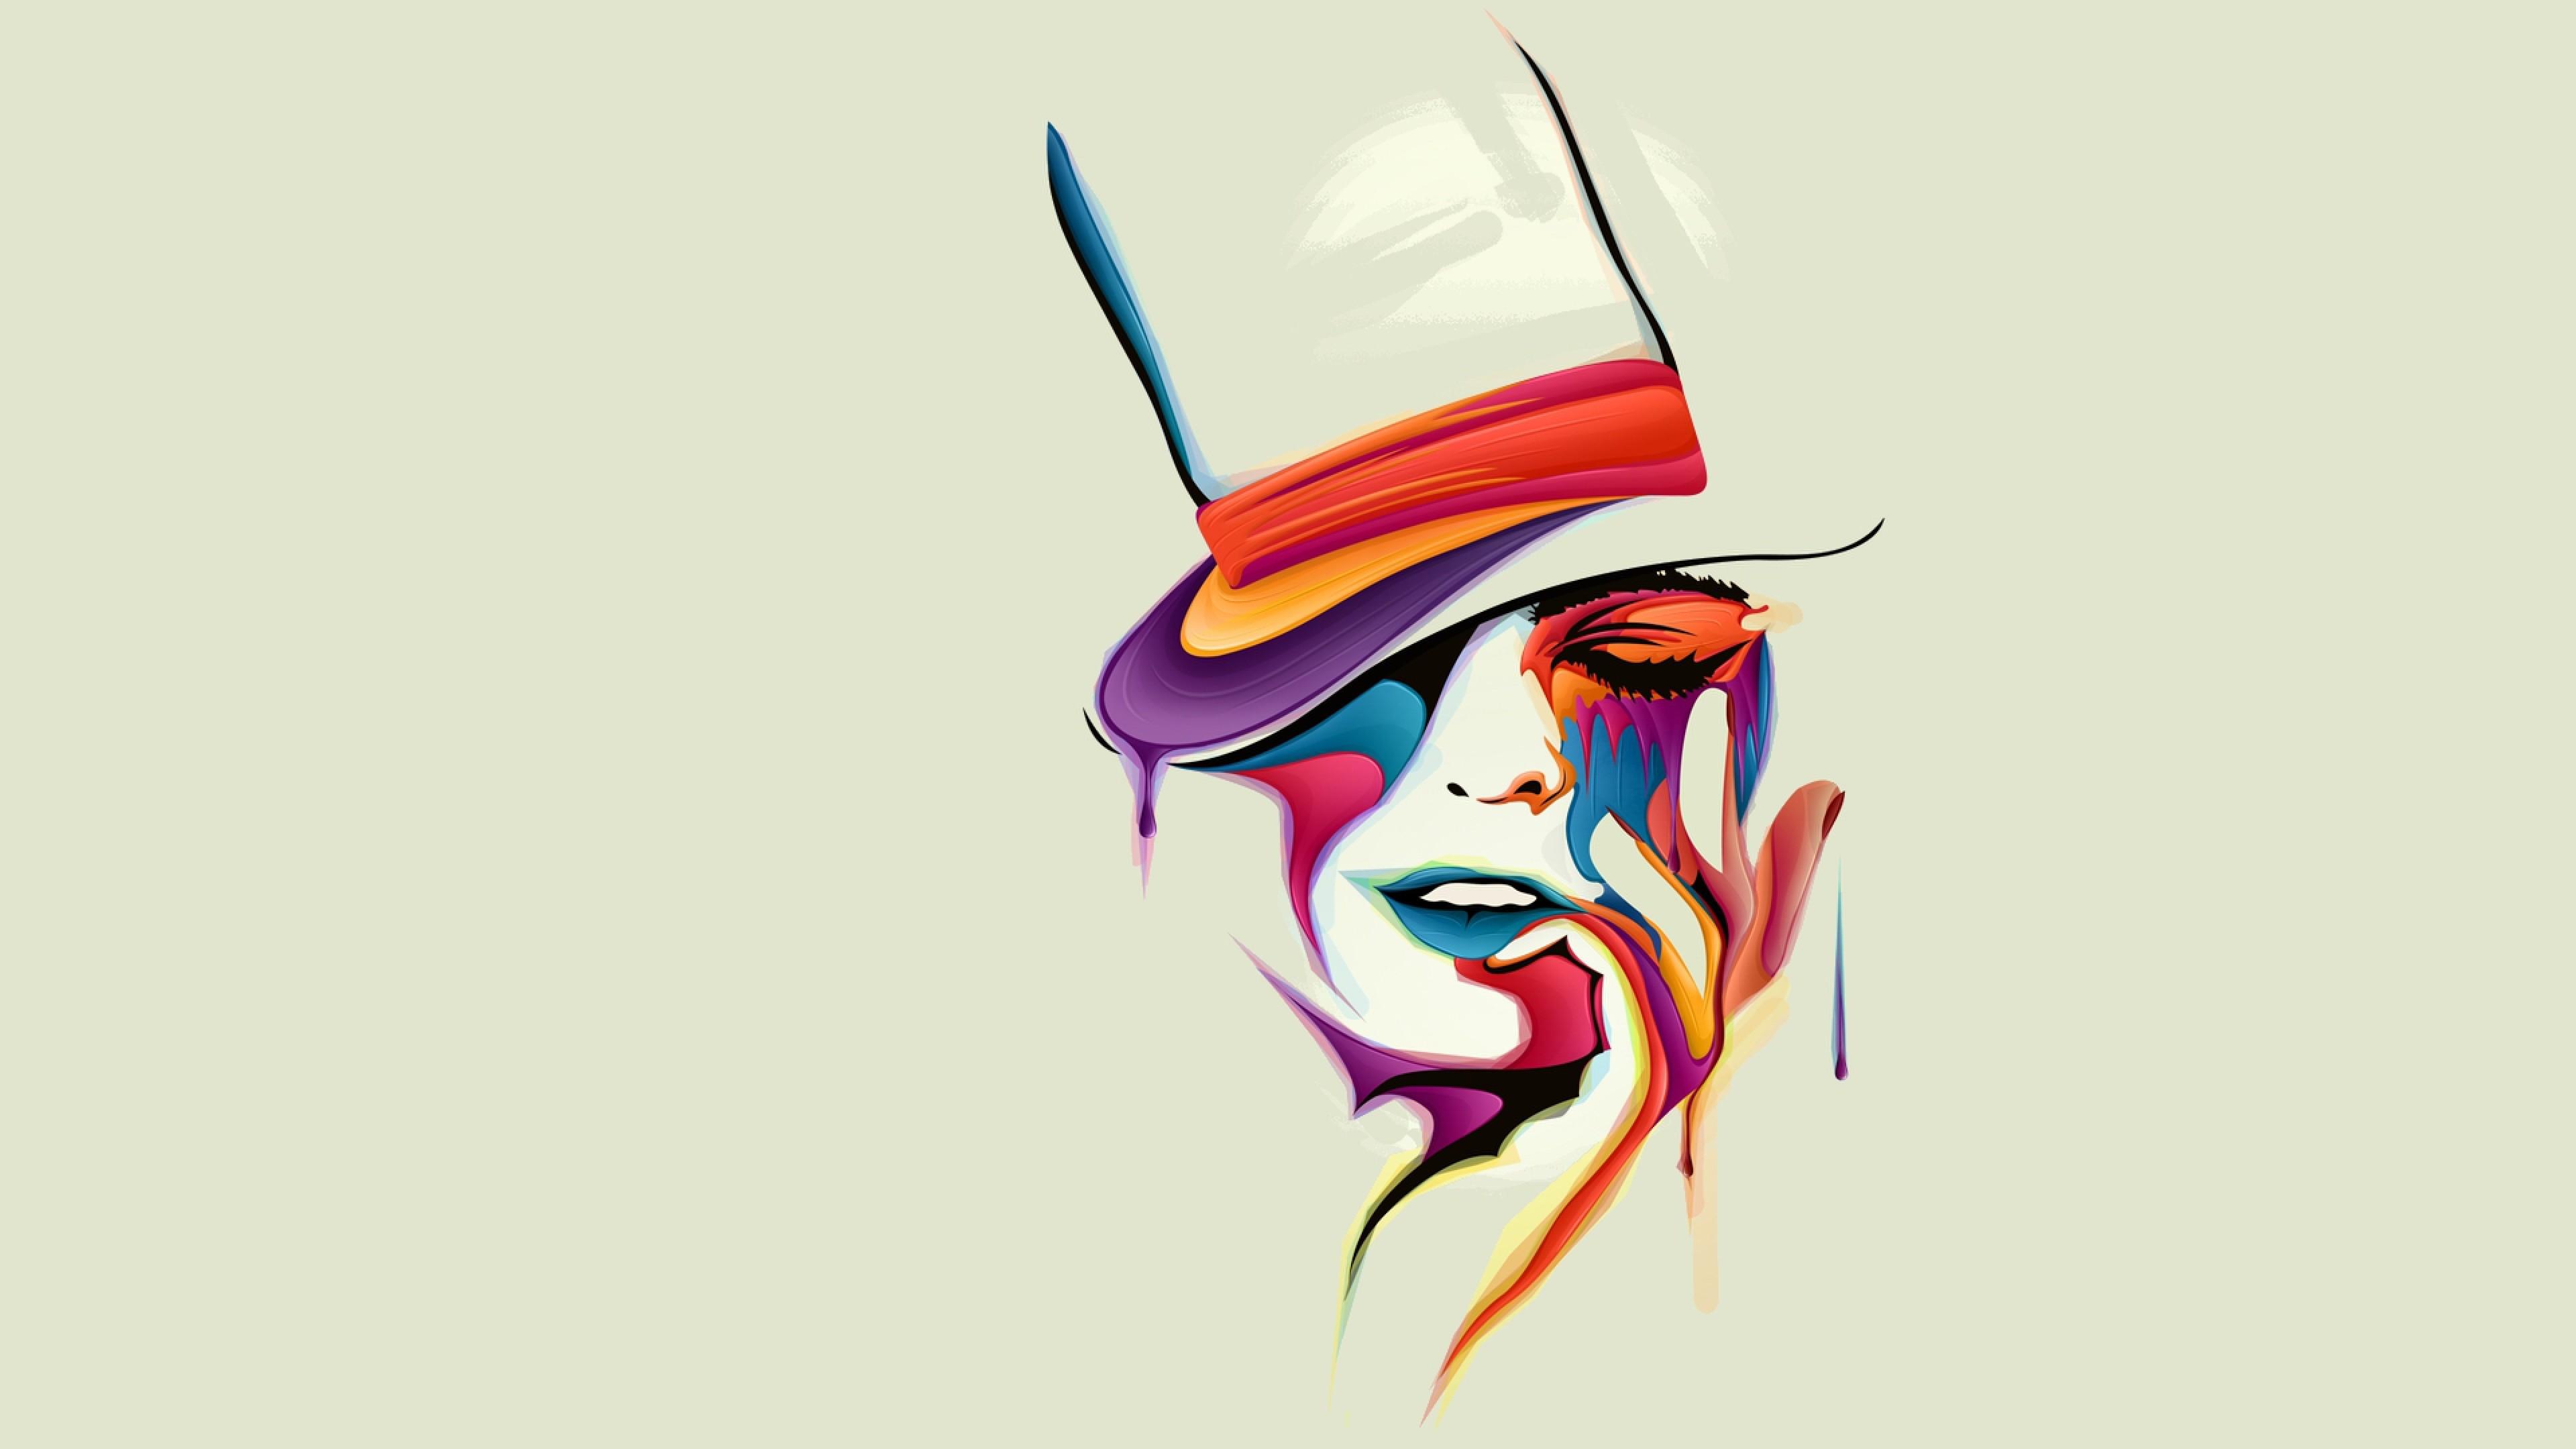 face vector art 4k 1540748381 - Face Vector Art 4k - vector wallpapers, face wallpapers, digital art wallpapers, colorful wallpapers, artist wallpapers, art wallpapers